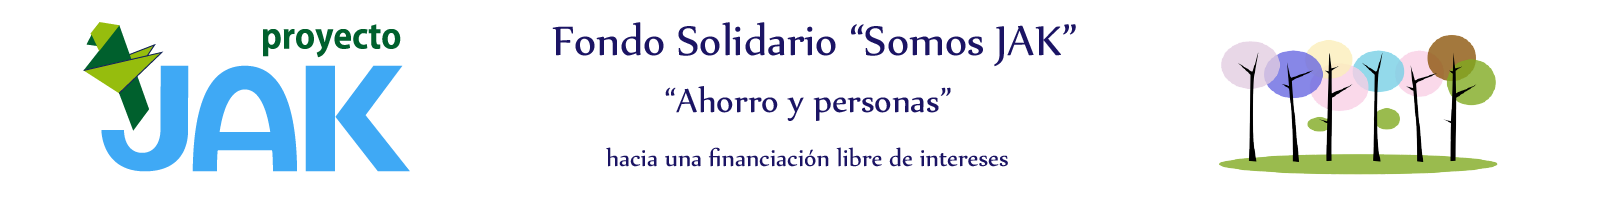 "Cabecera especial apertura de Fondo Solidario ""Somos JAK"""